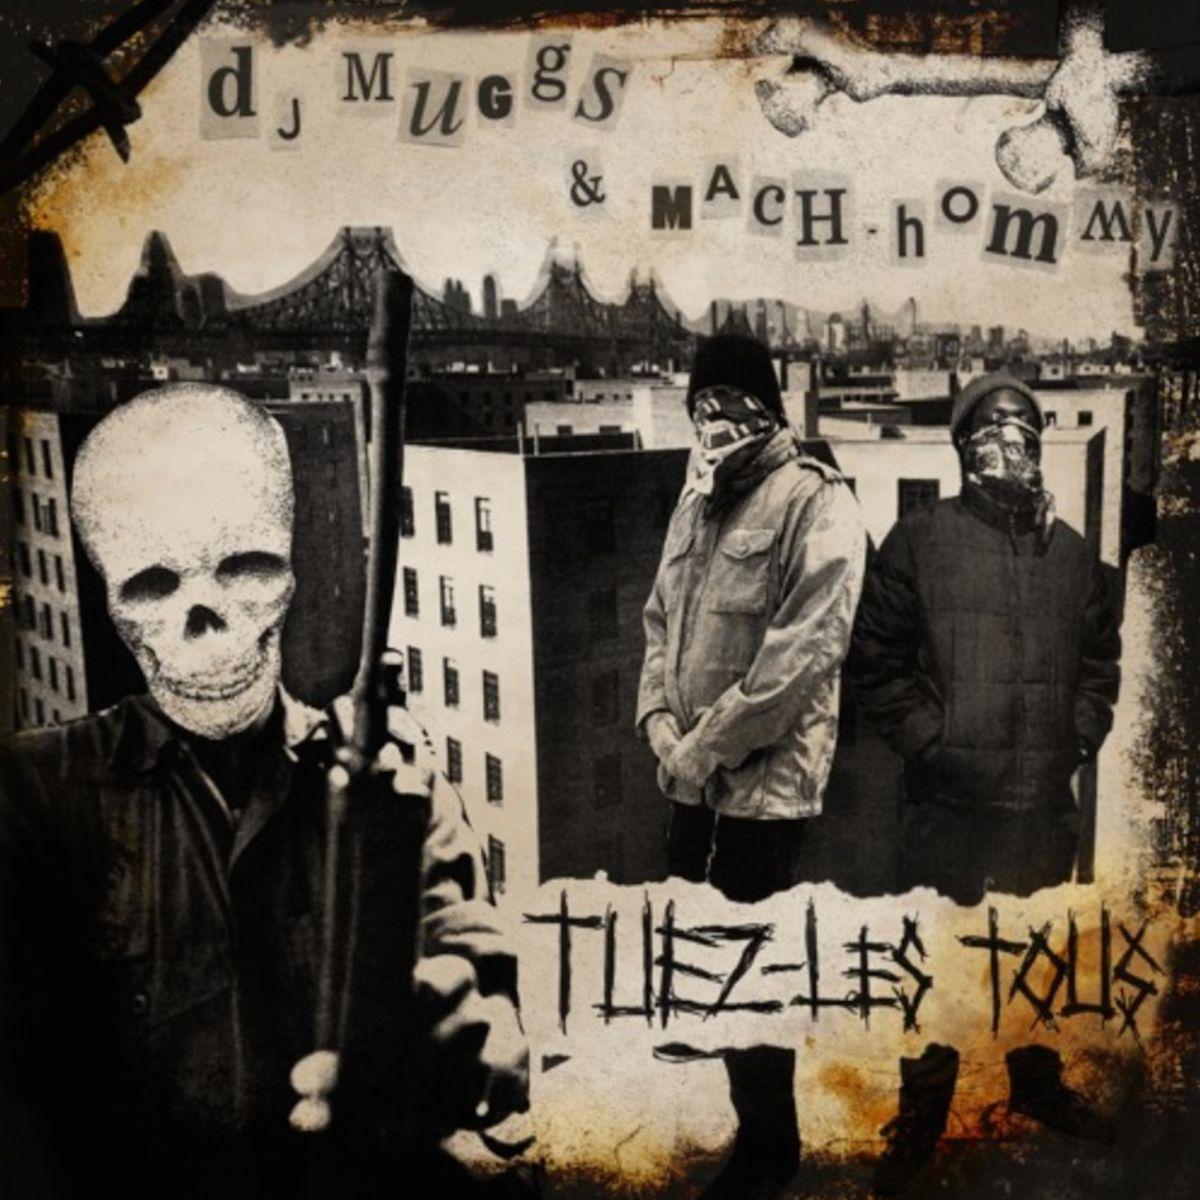 DJ Muggs & Mach-Hommy: Tuez-Les Tous review – Hard-boiled